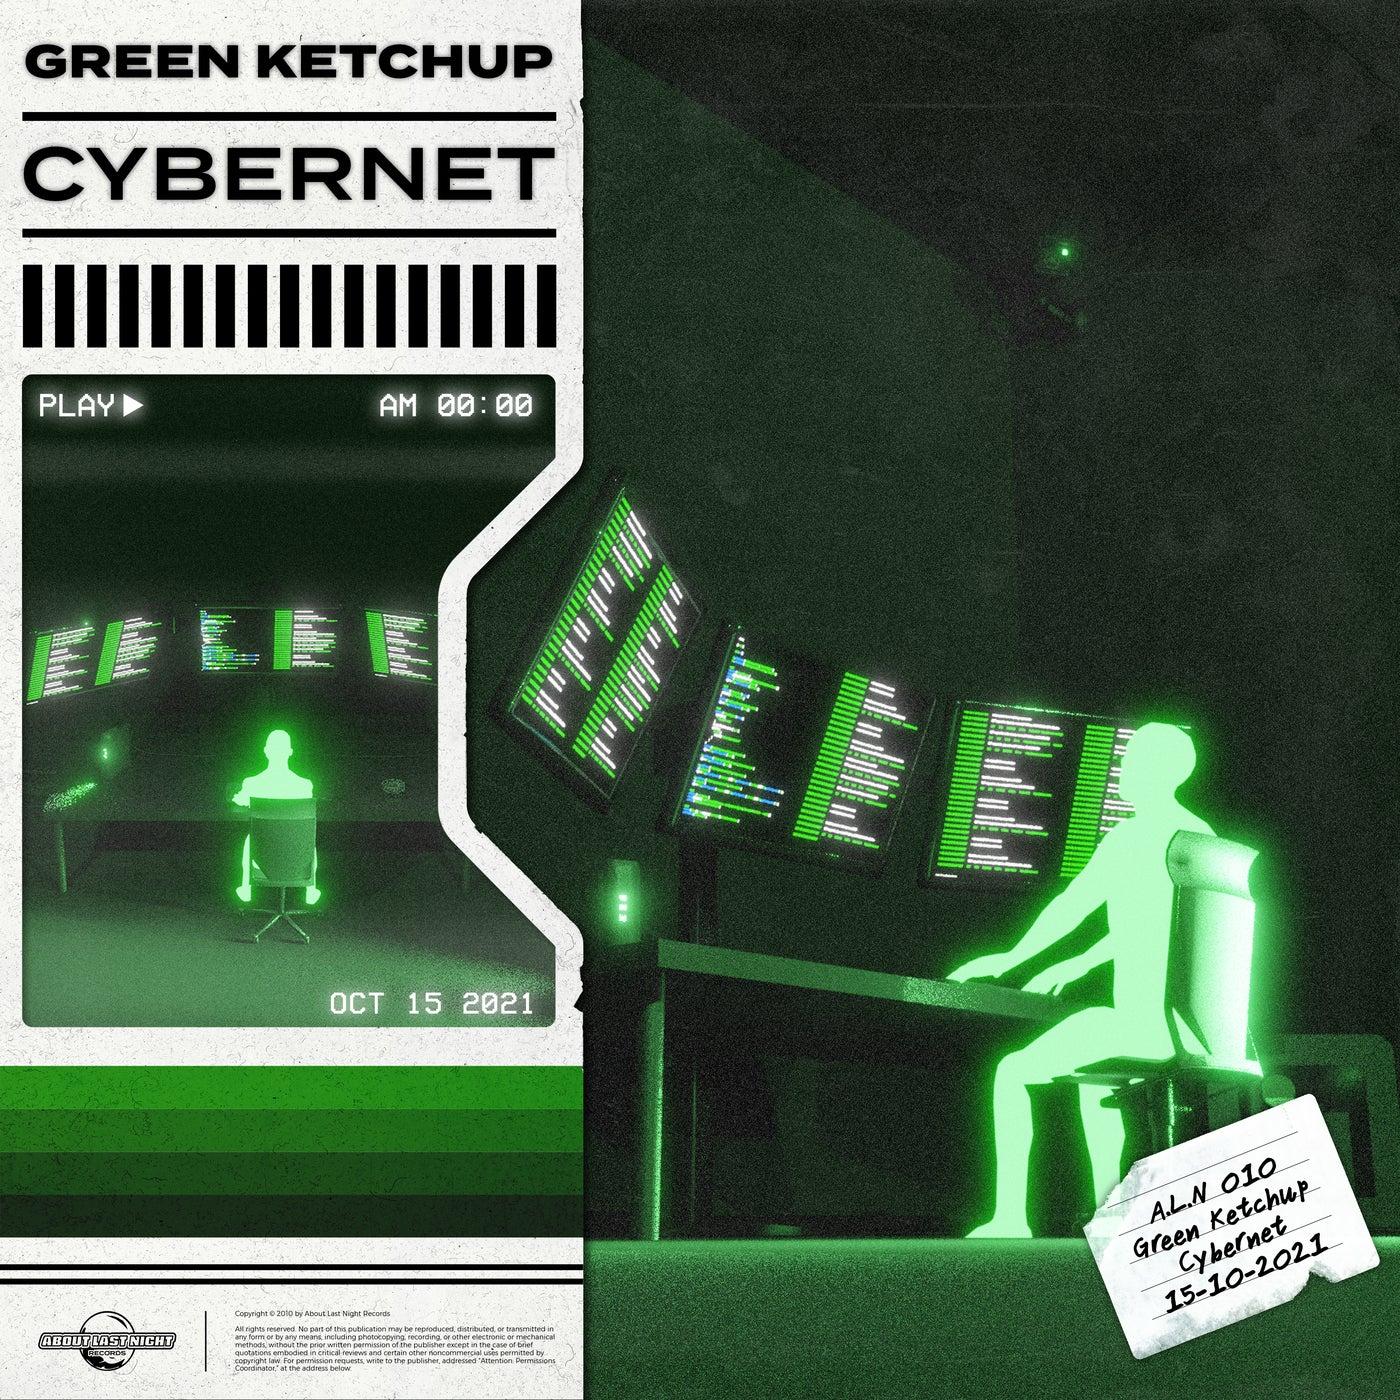 Cybernet (Original Mix)